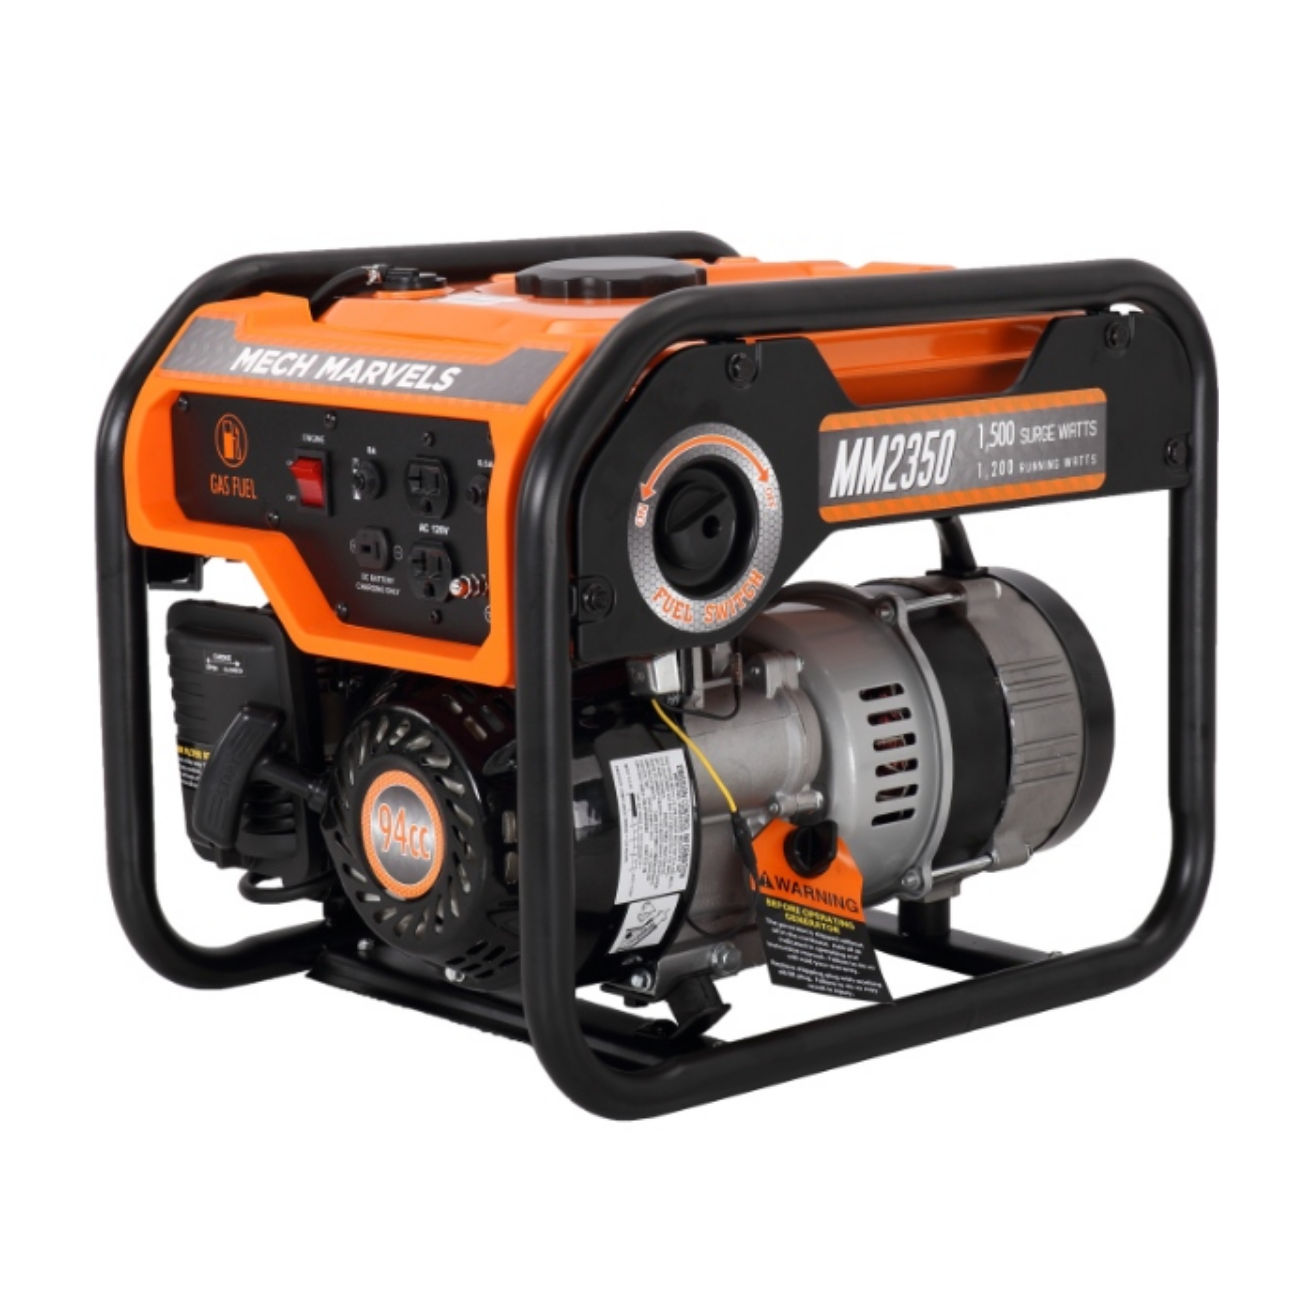 MM2350 1500W Gasoline Portable Generator